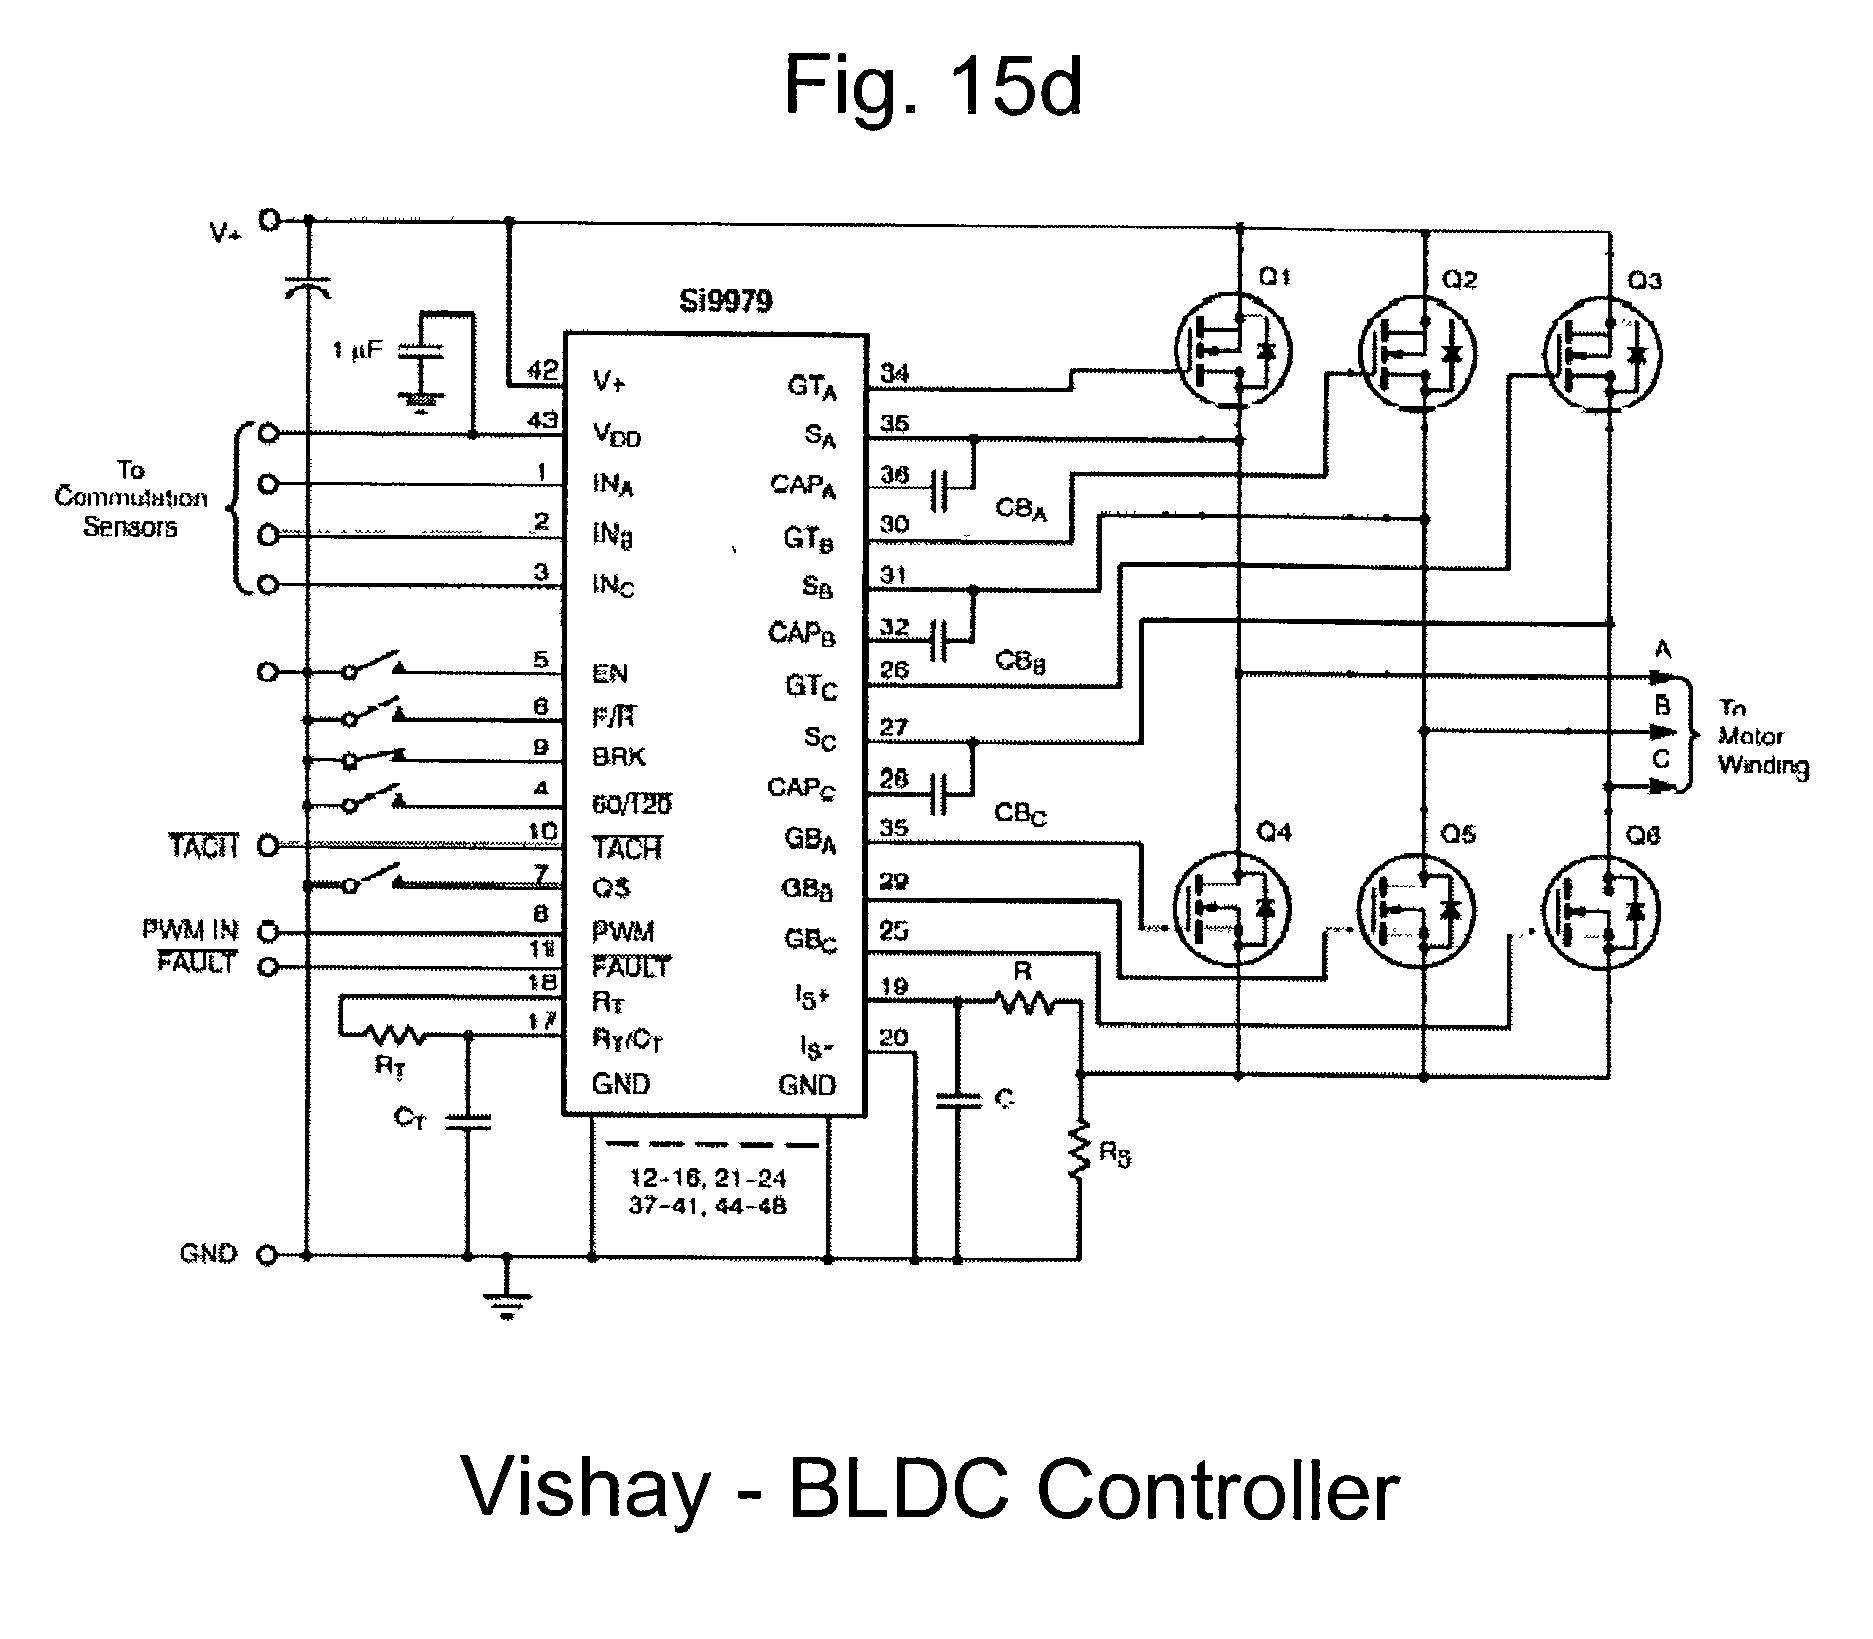 hi torque starter wiring diagram kubota rtv 900 fuse box kubota rtv 900 ignition switch wiring